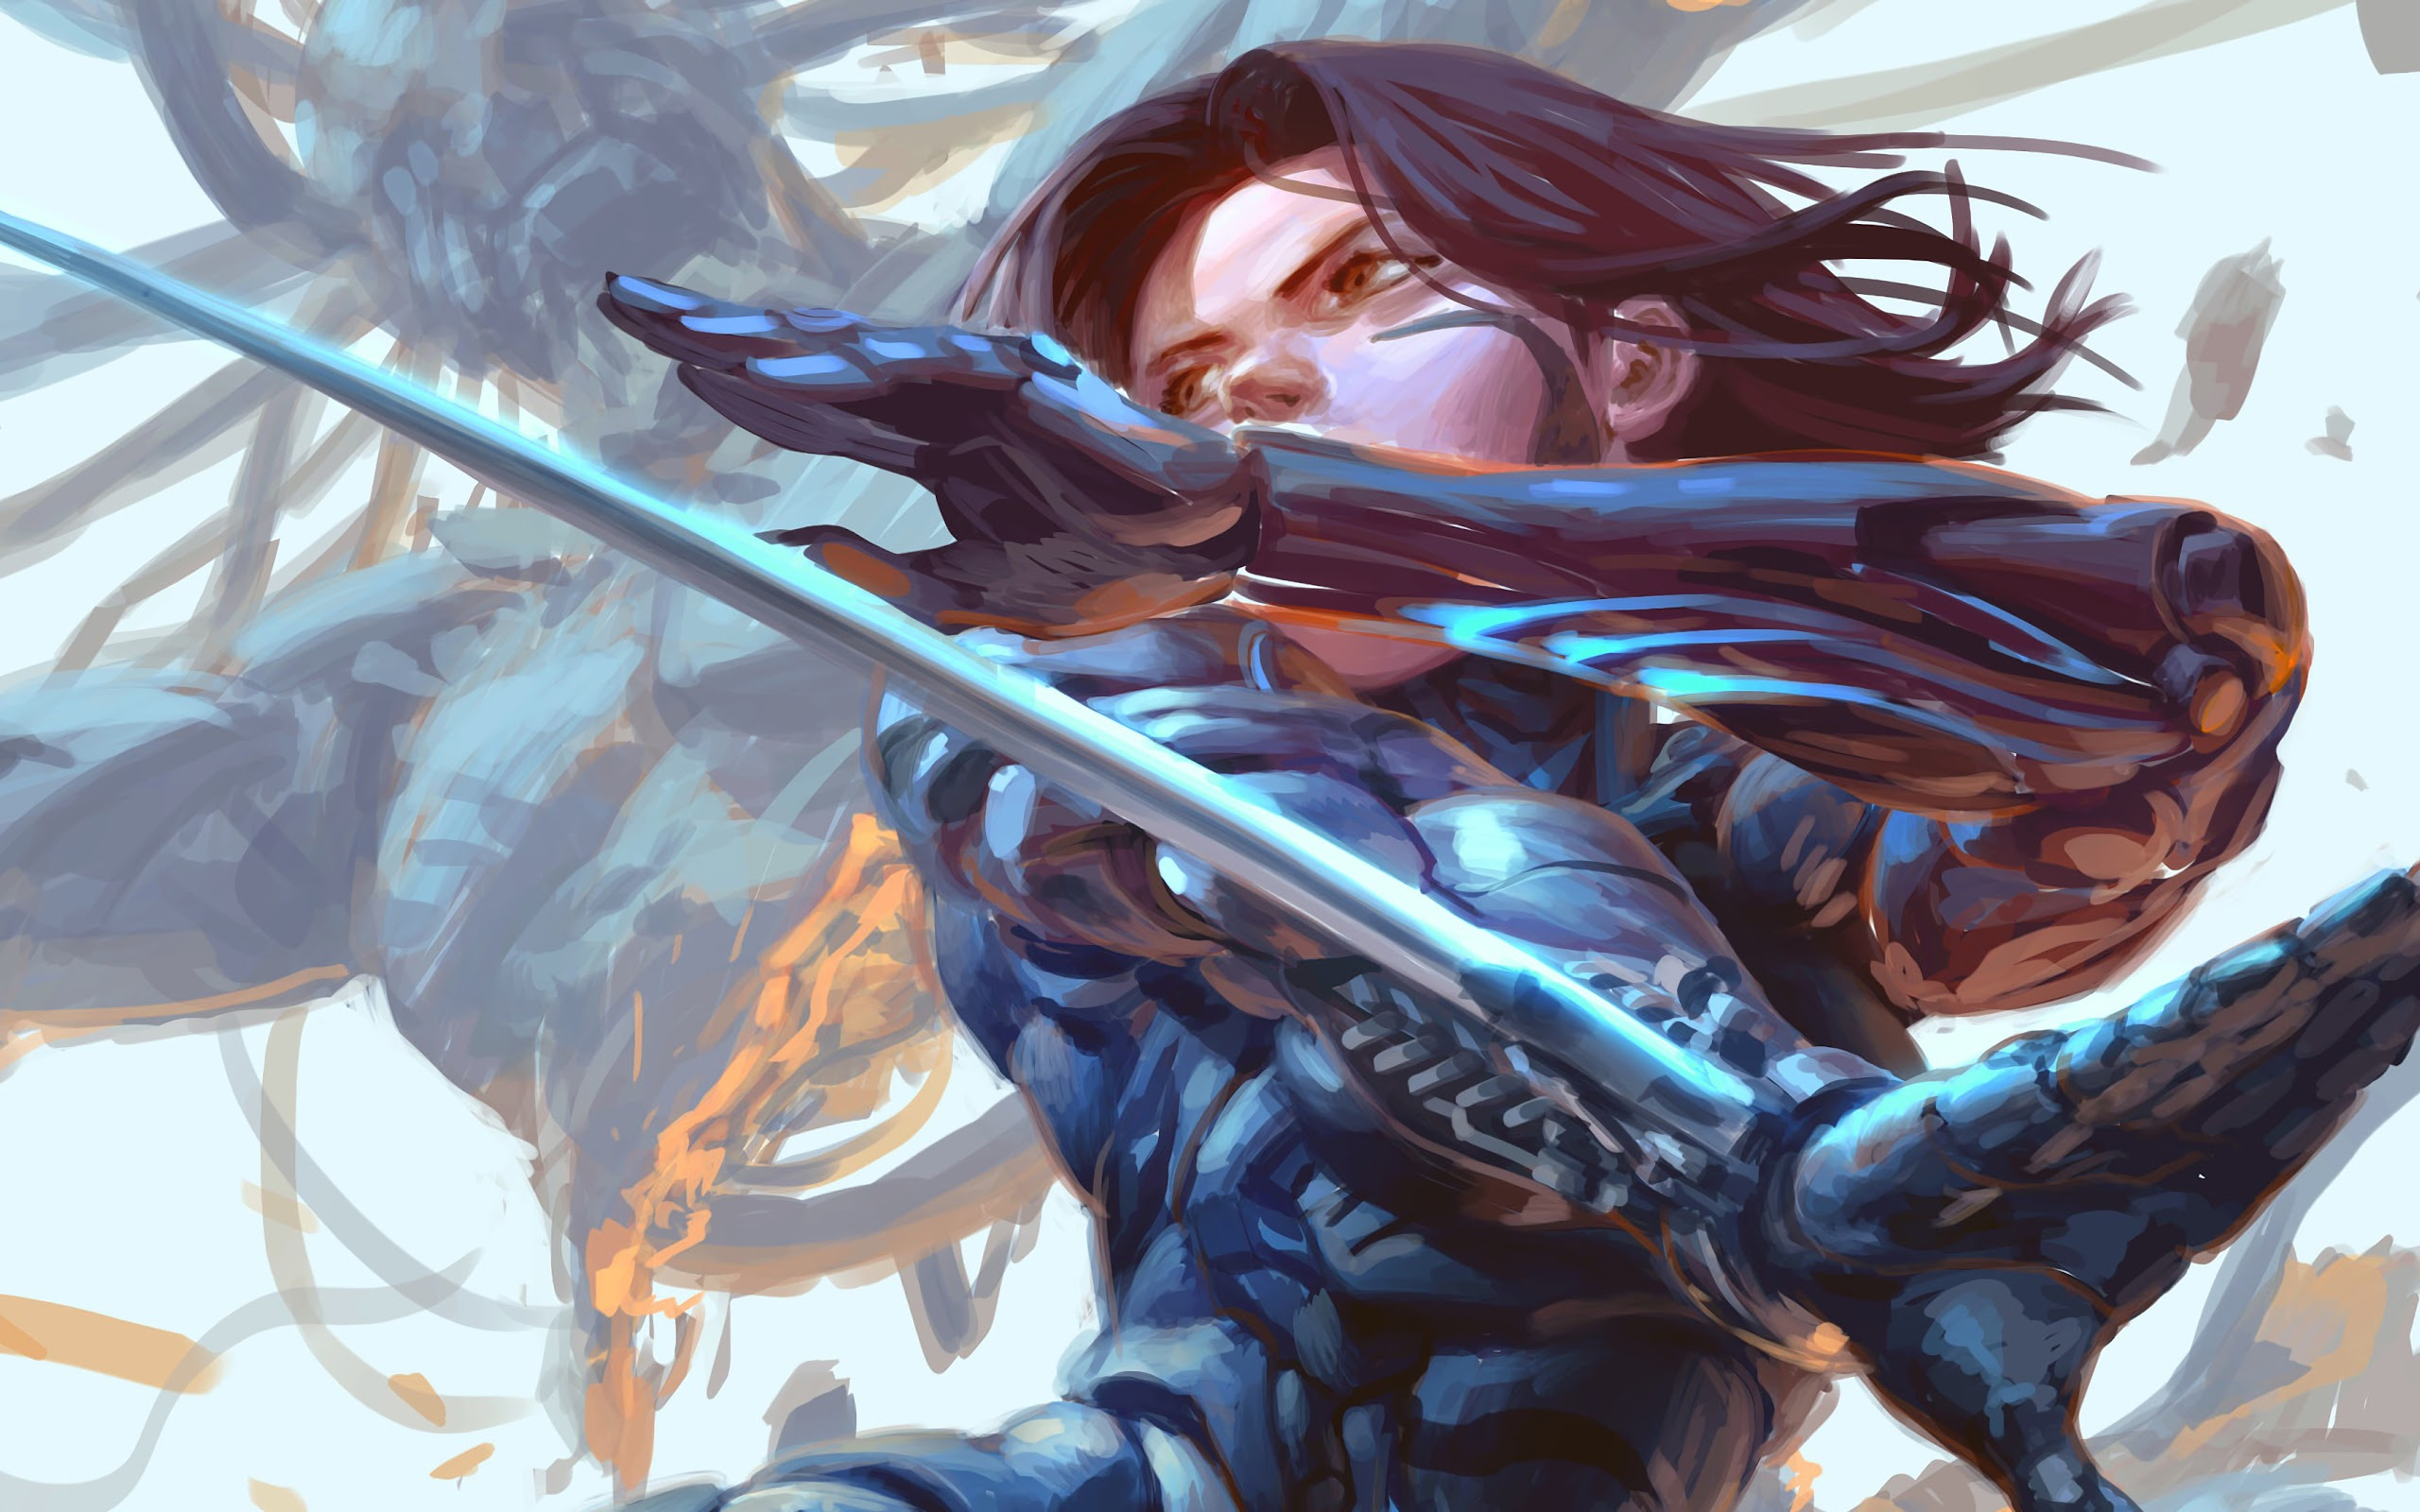 General 2560x1600 Alita Alita: Battle Angel artwork women